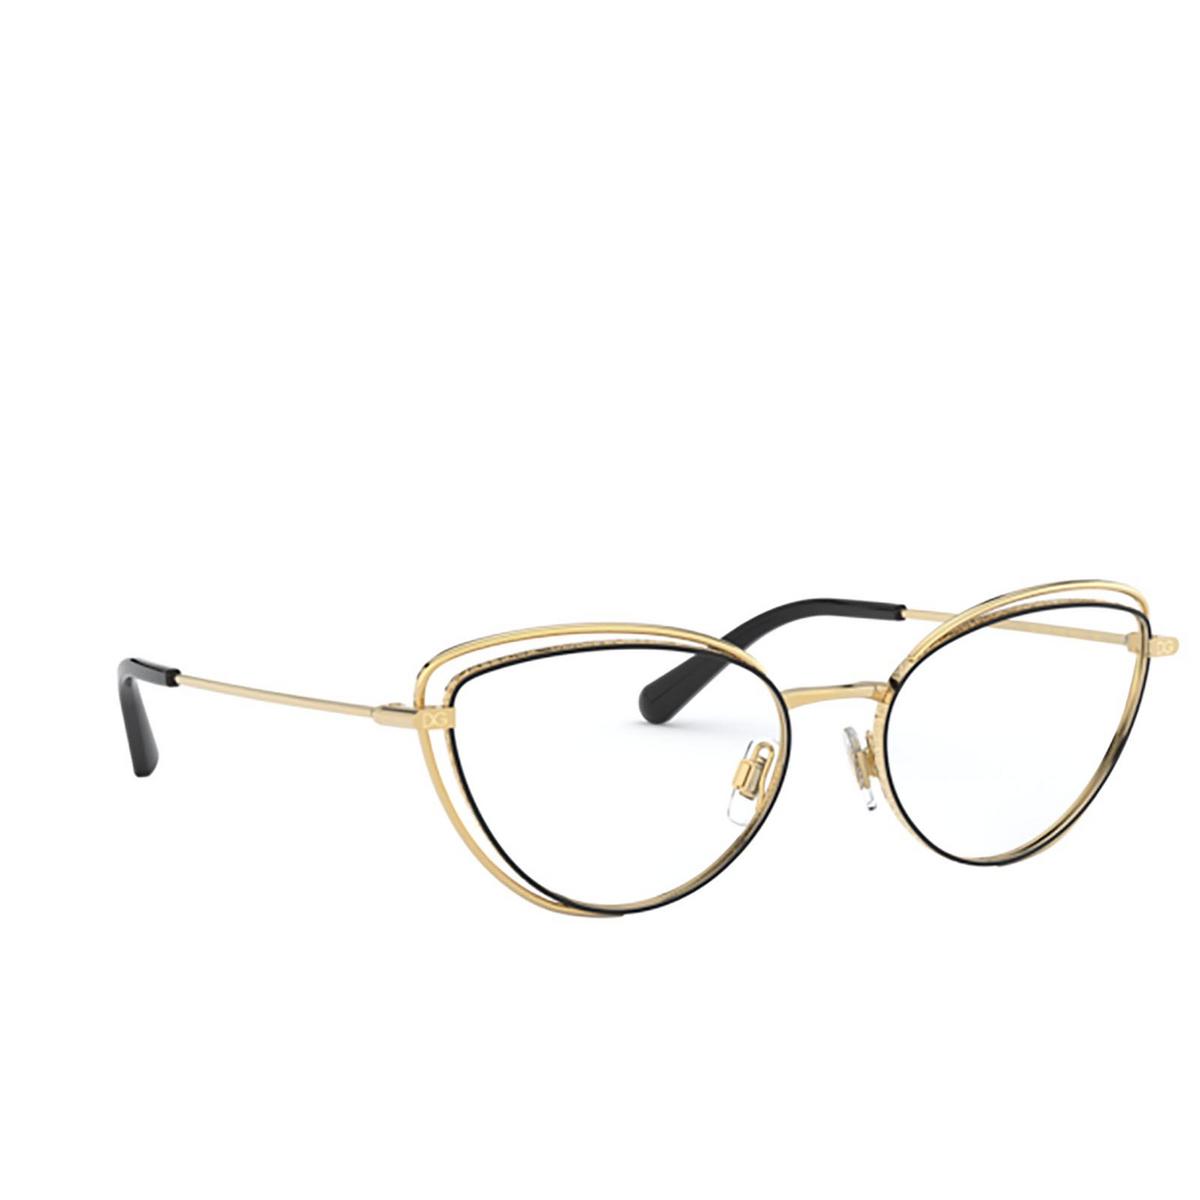 Dolce & Gabbana® Cat-eye Eyeglasses: DG1326 color Gold / Brown 1344 - three-quarters view.